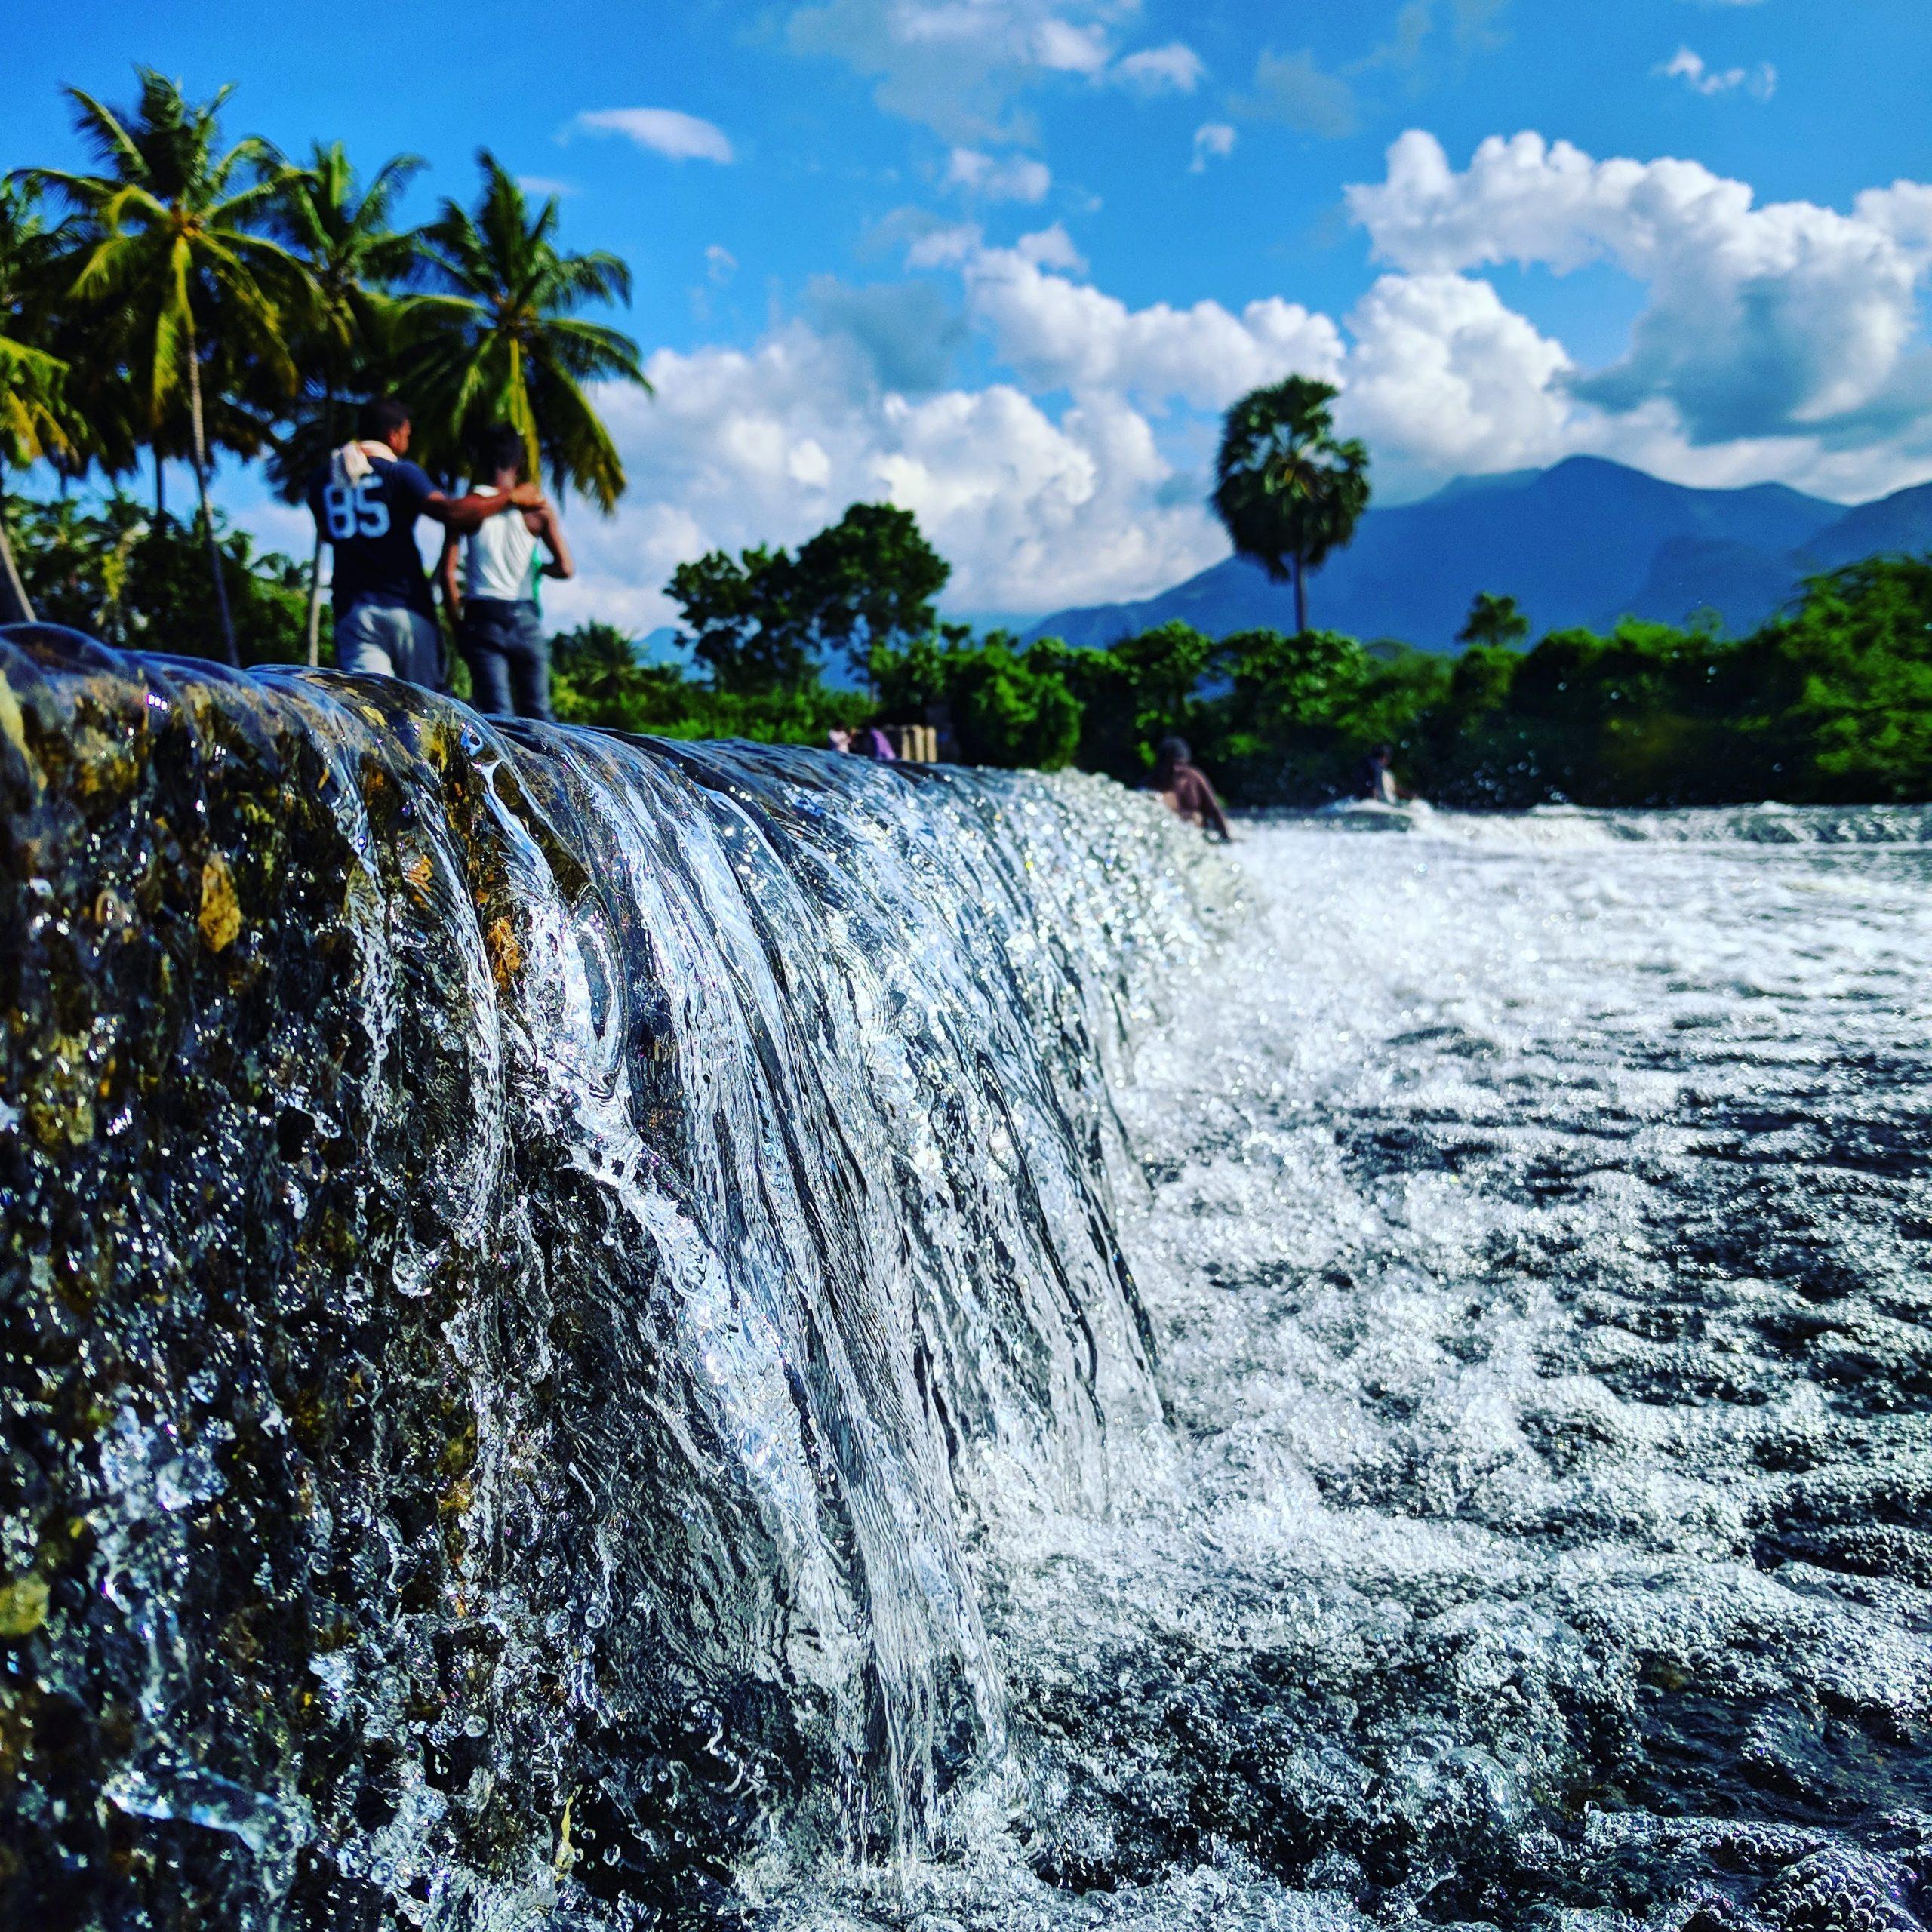 Water Streams Splash Scenery